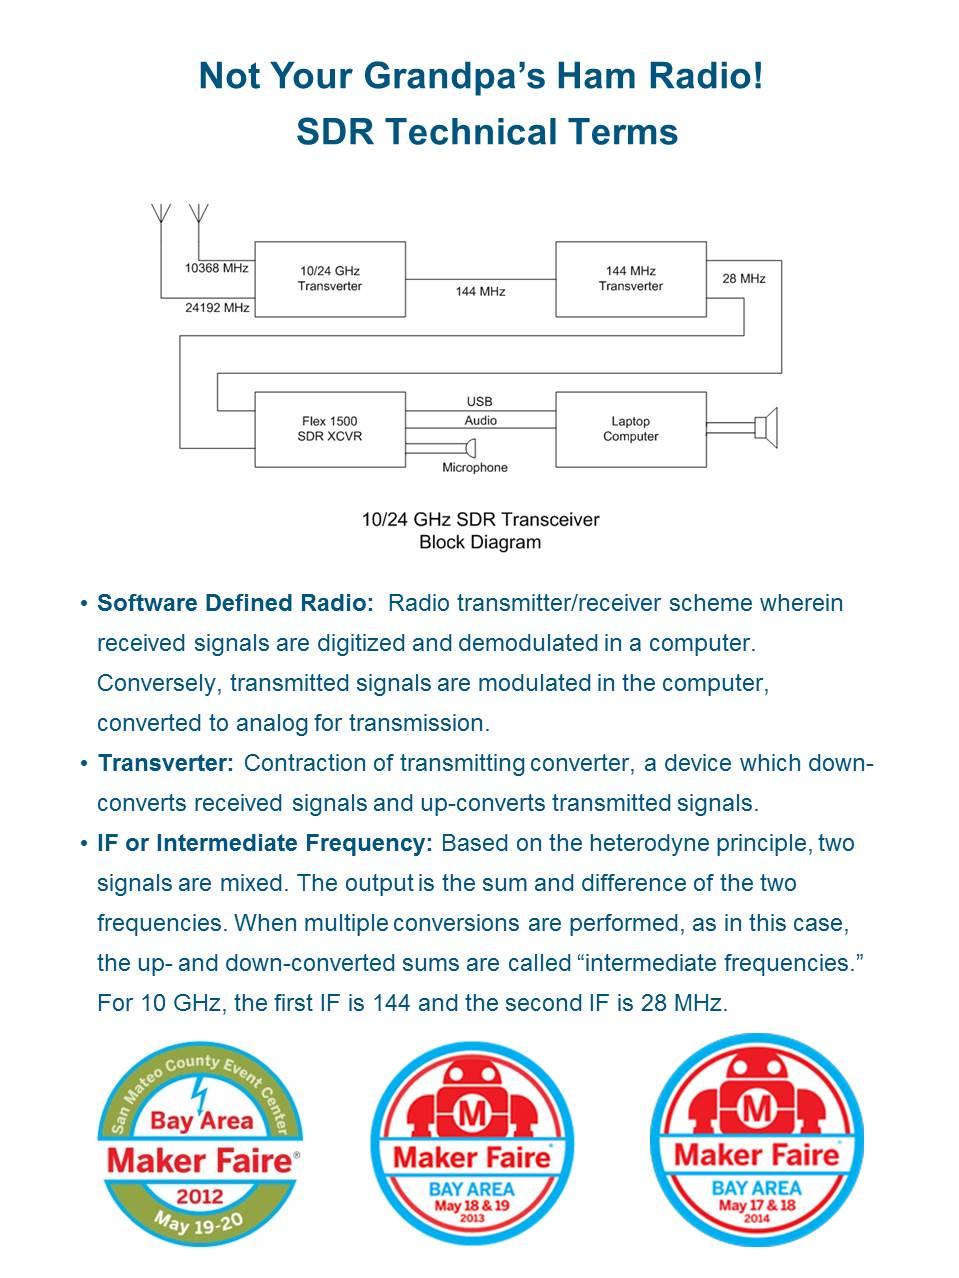 Dual band 10-24 GHz SDR 2 | wayneyoshidakh6wz